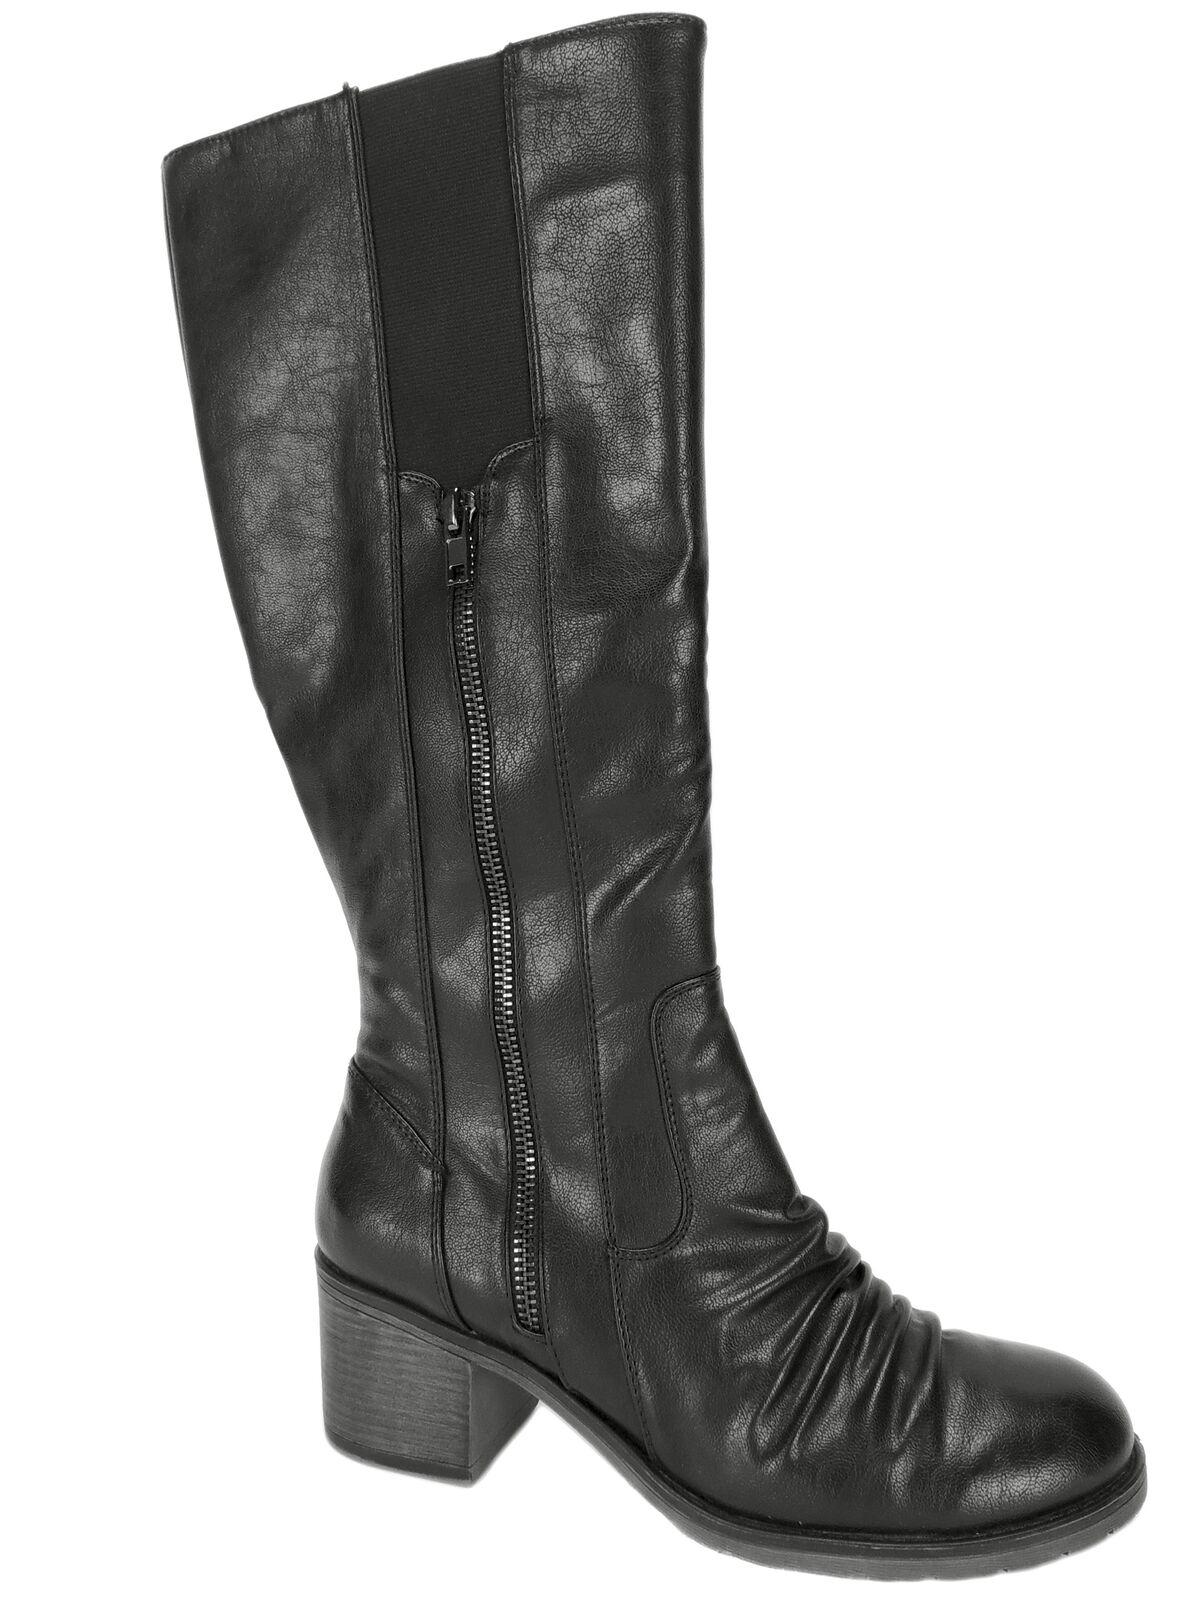 Bare Traps Women's Dallia Block-Heel Boots Black Size 11 M